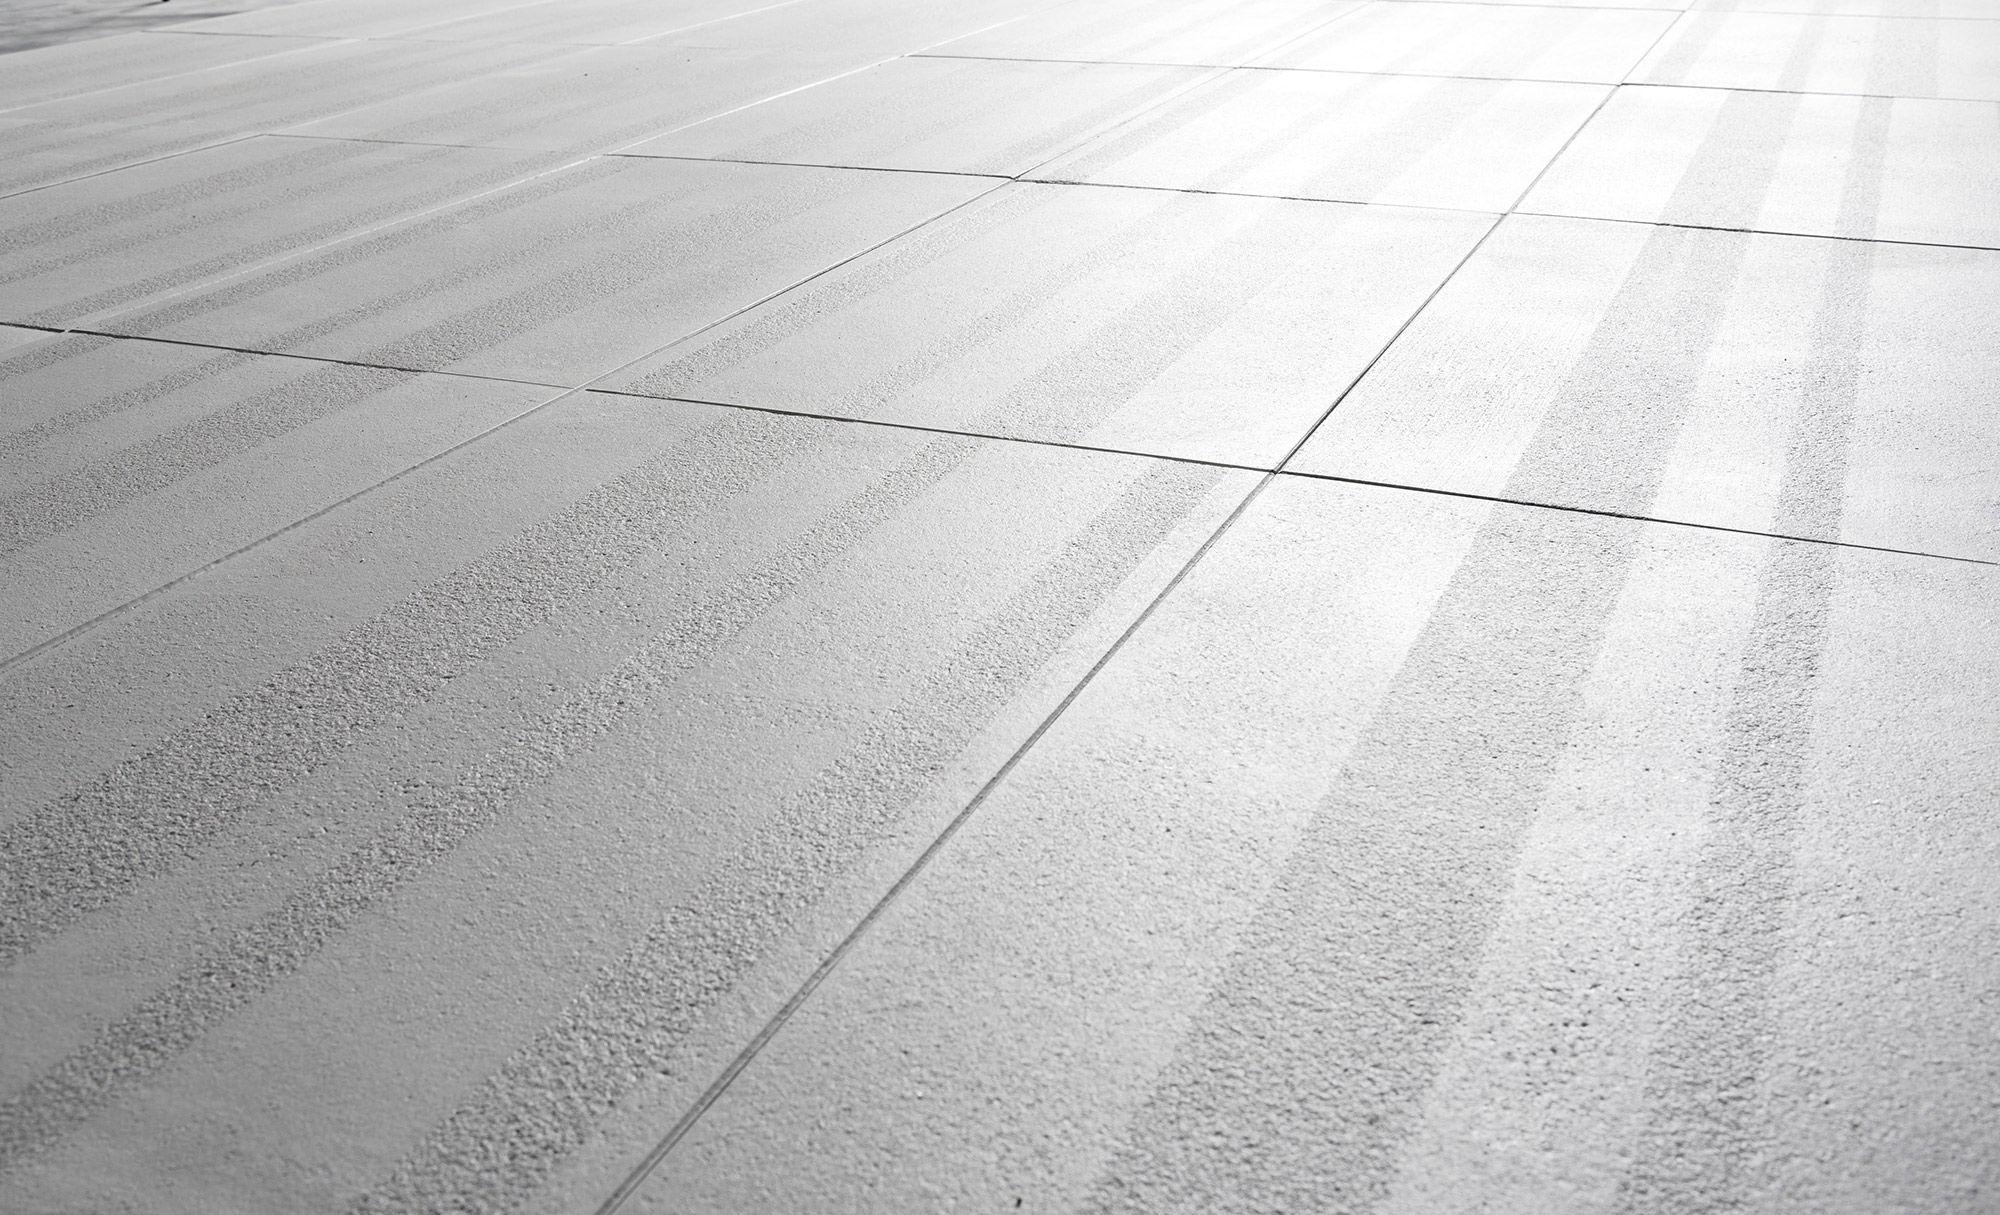 Outdoor tile floor concrete striped graffiti by pamio design outdoor tile floor concrete striped dailygadgetfo Images